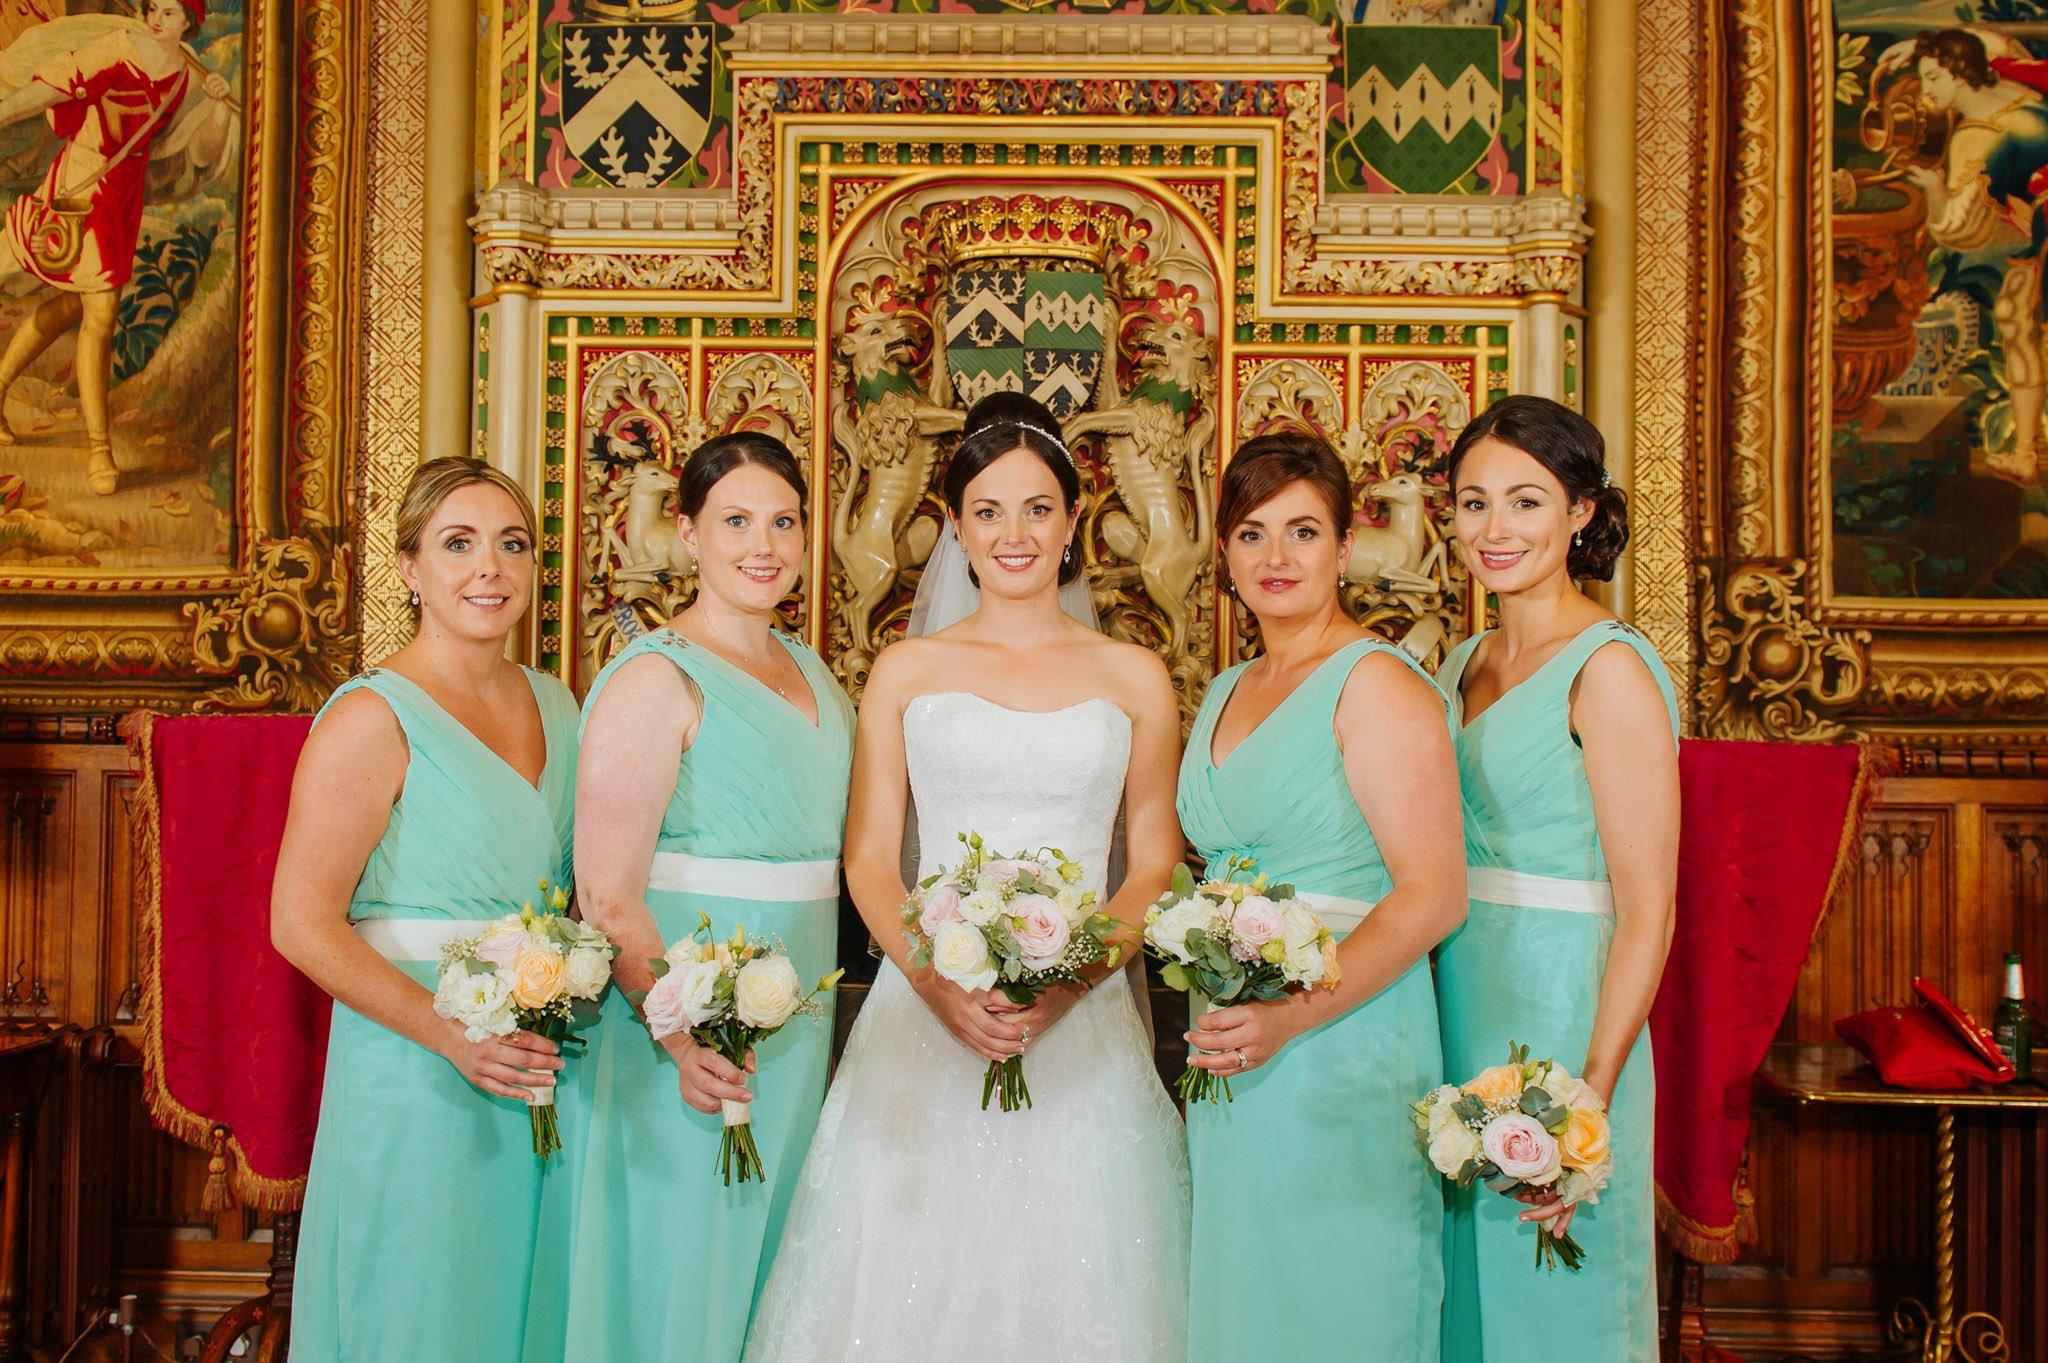 Eastnor Castle wedding photographer Herefordshire, West Midlands - Sarah + Dean 13